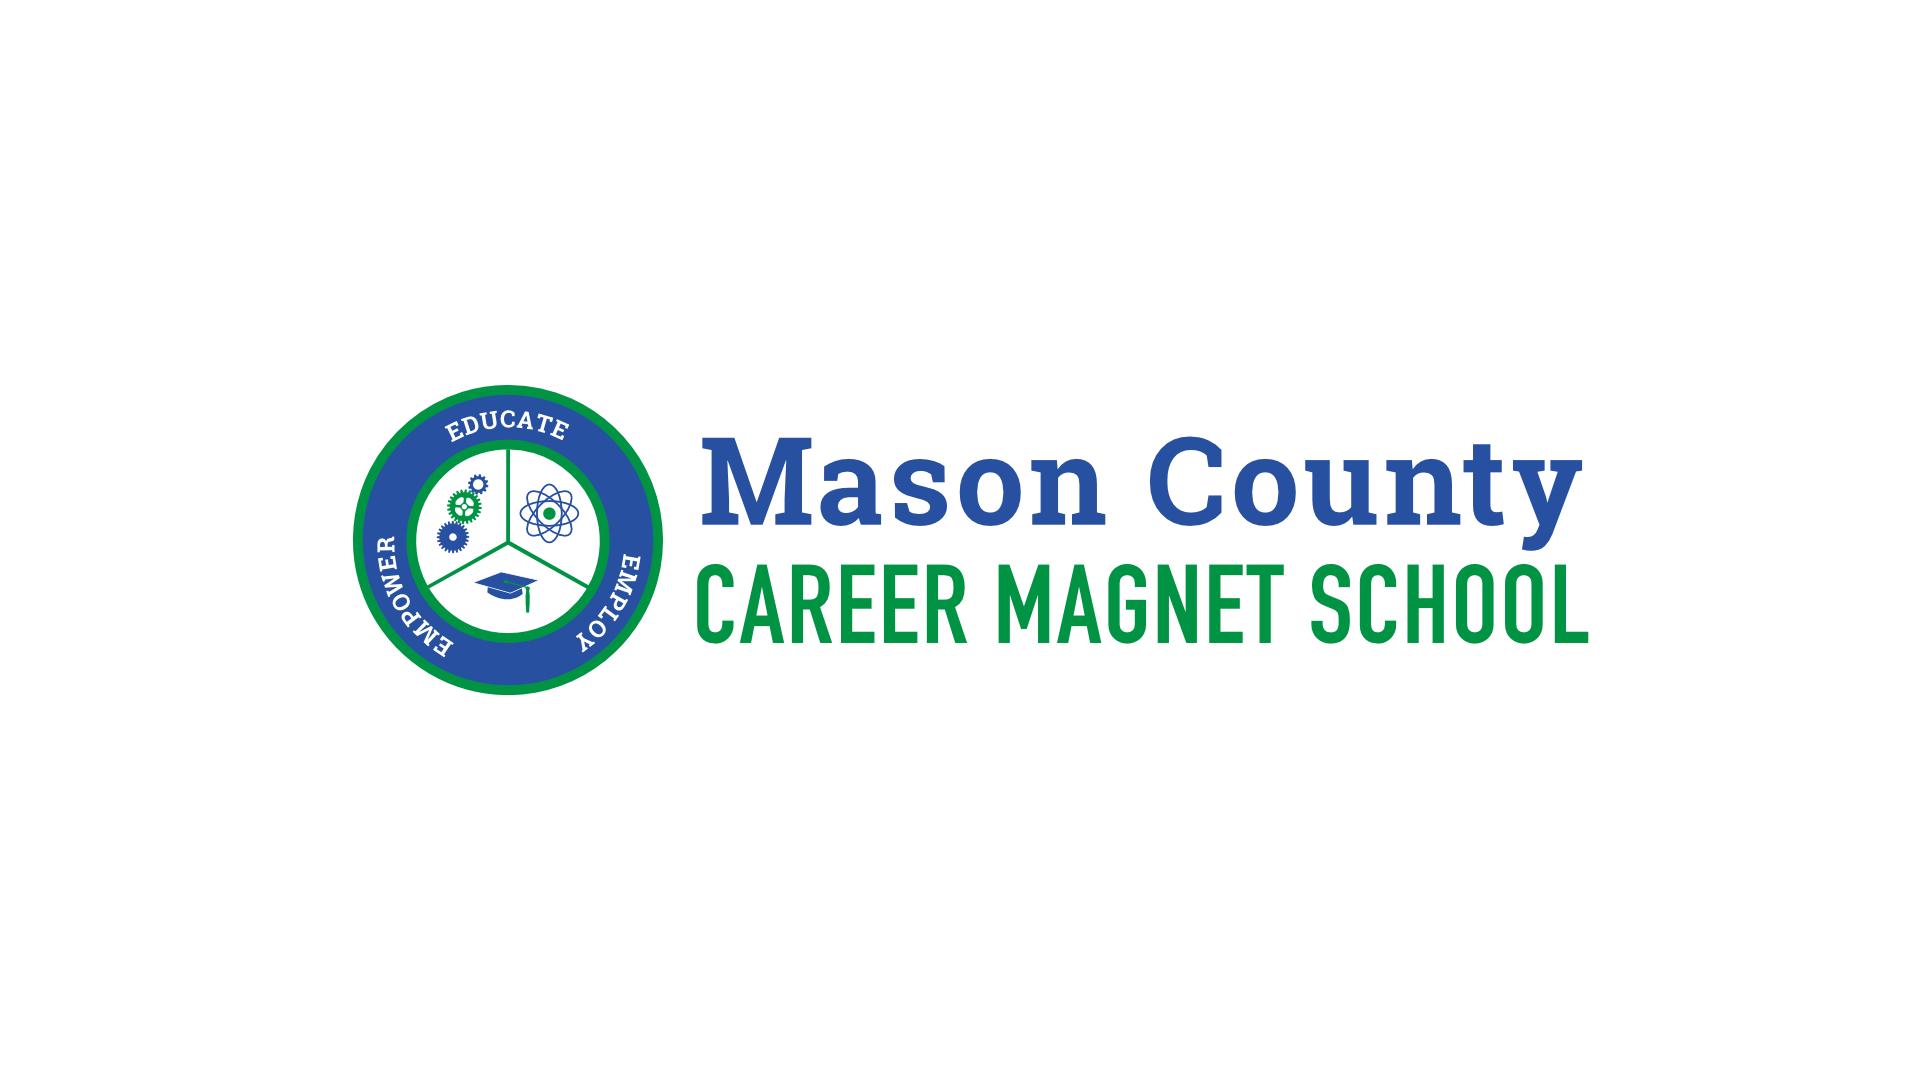 Mason County Career Magnet School logo